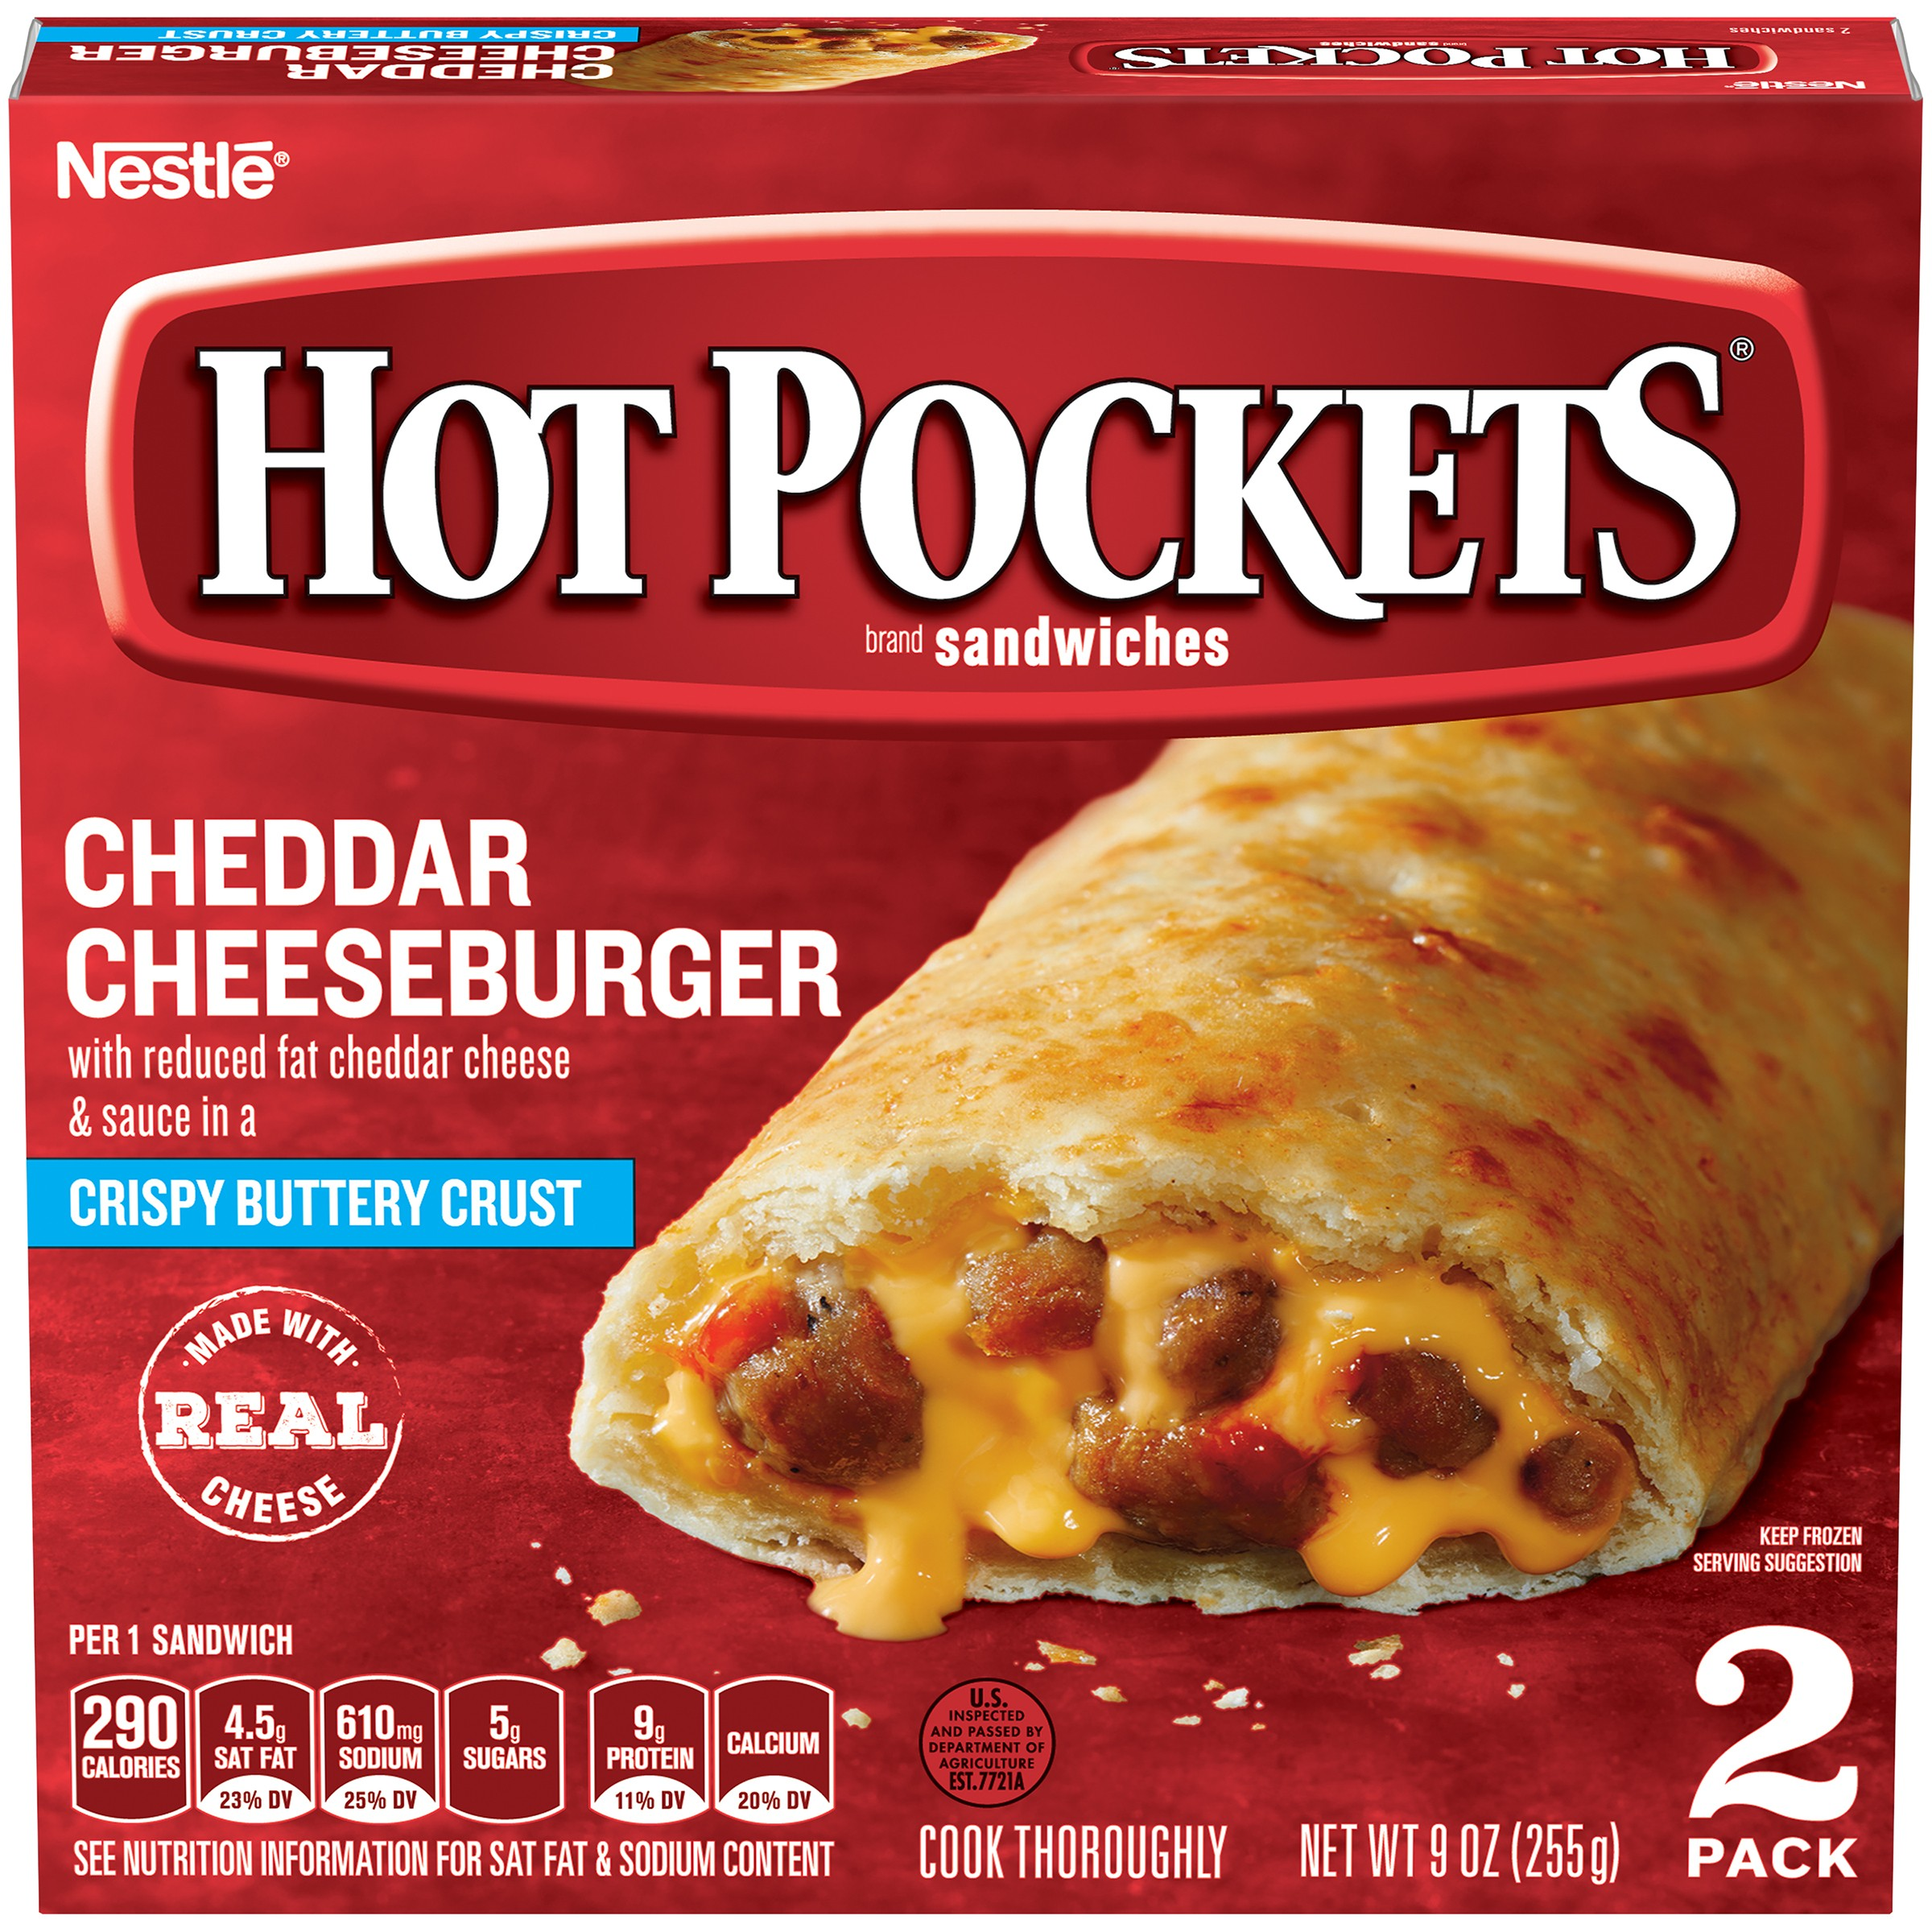 HOT POCKETS Cheddar Cheeseburger Frozen Sandwiches 2 ct Box